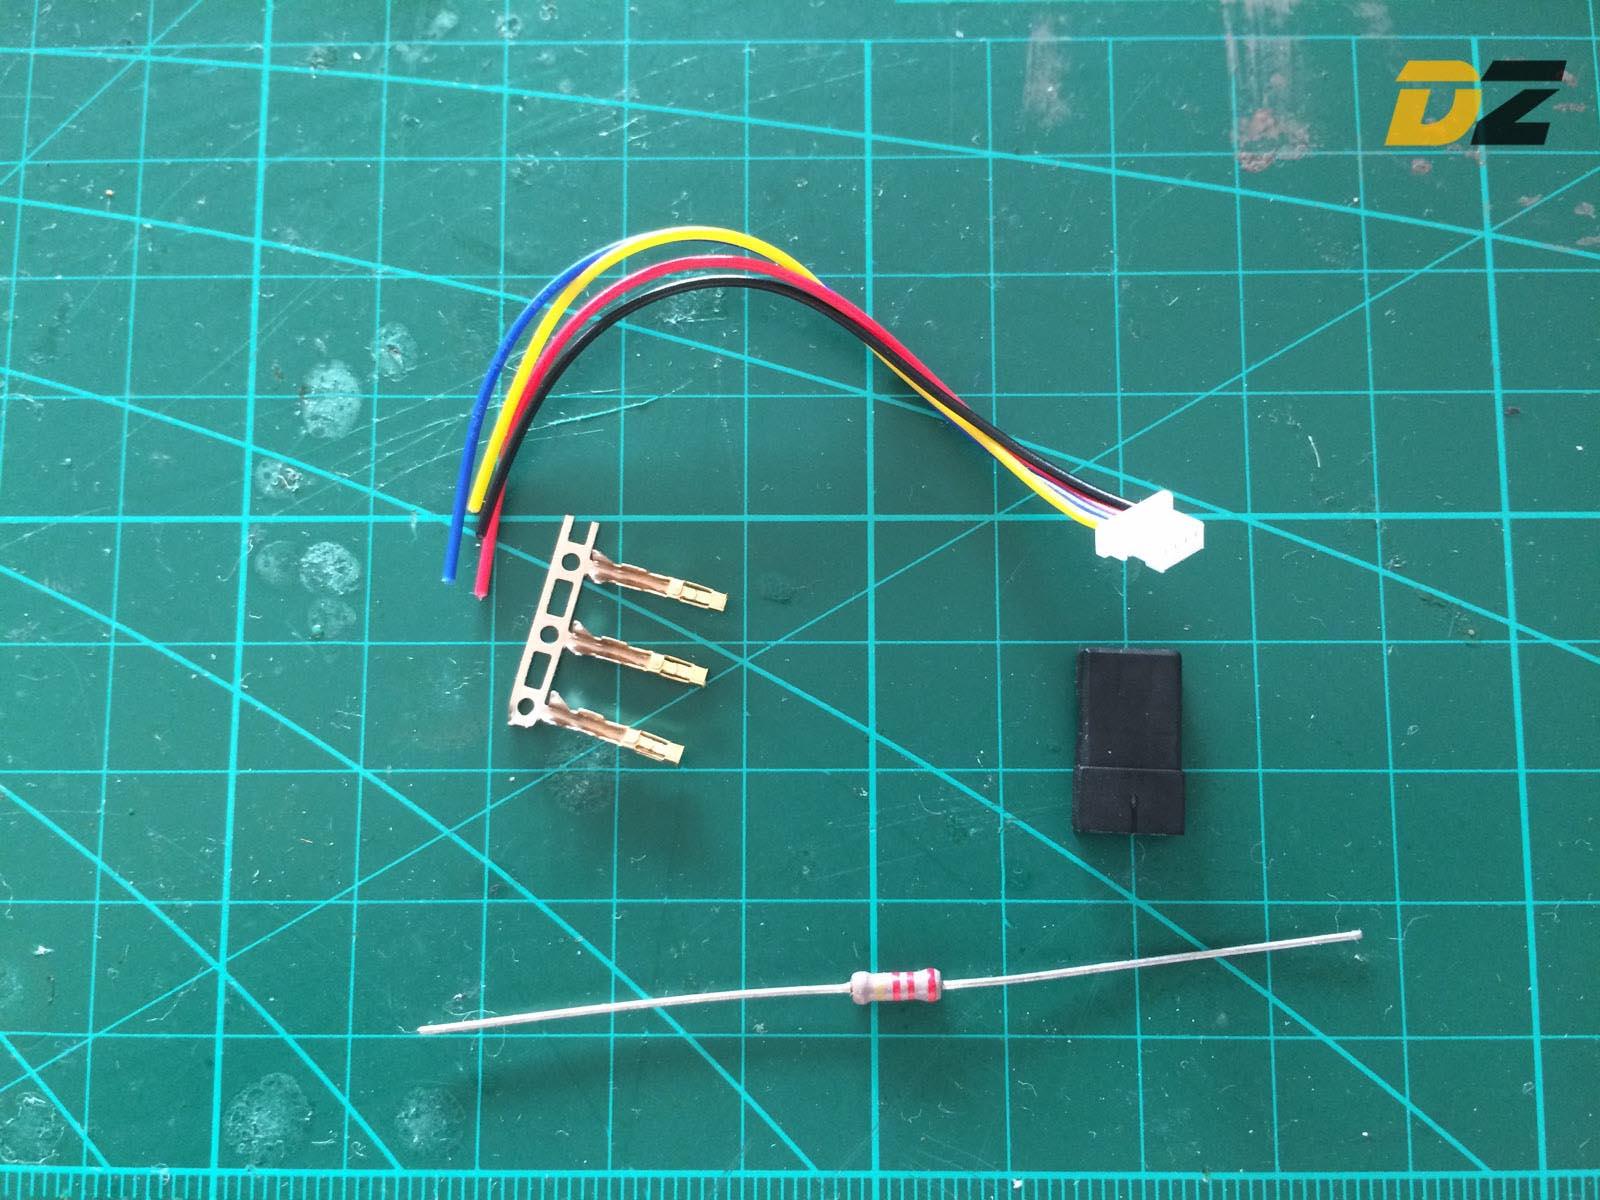 Anleitung Jeti Ex Telemetrie Mit Betaflight Cleanflight Drone Zone Cc3d Wiring Diagrams With Orange Rx Bus Teile